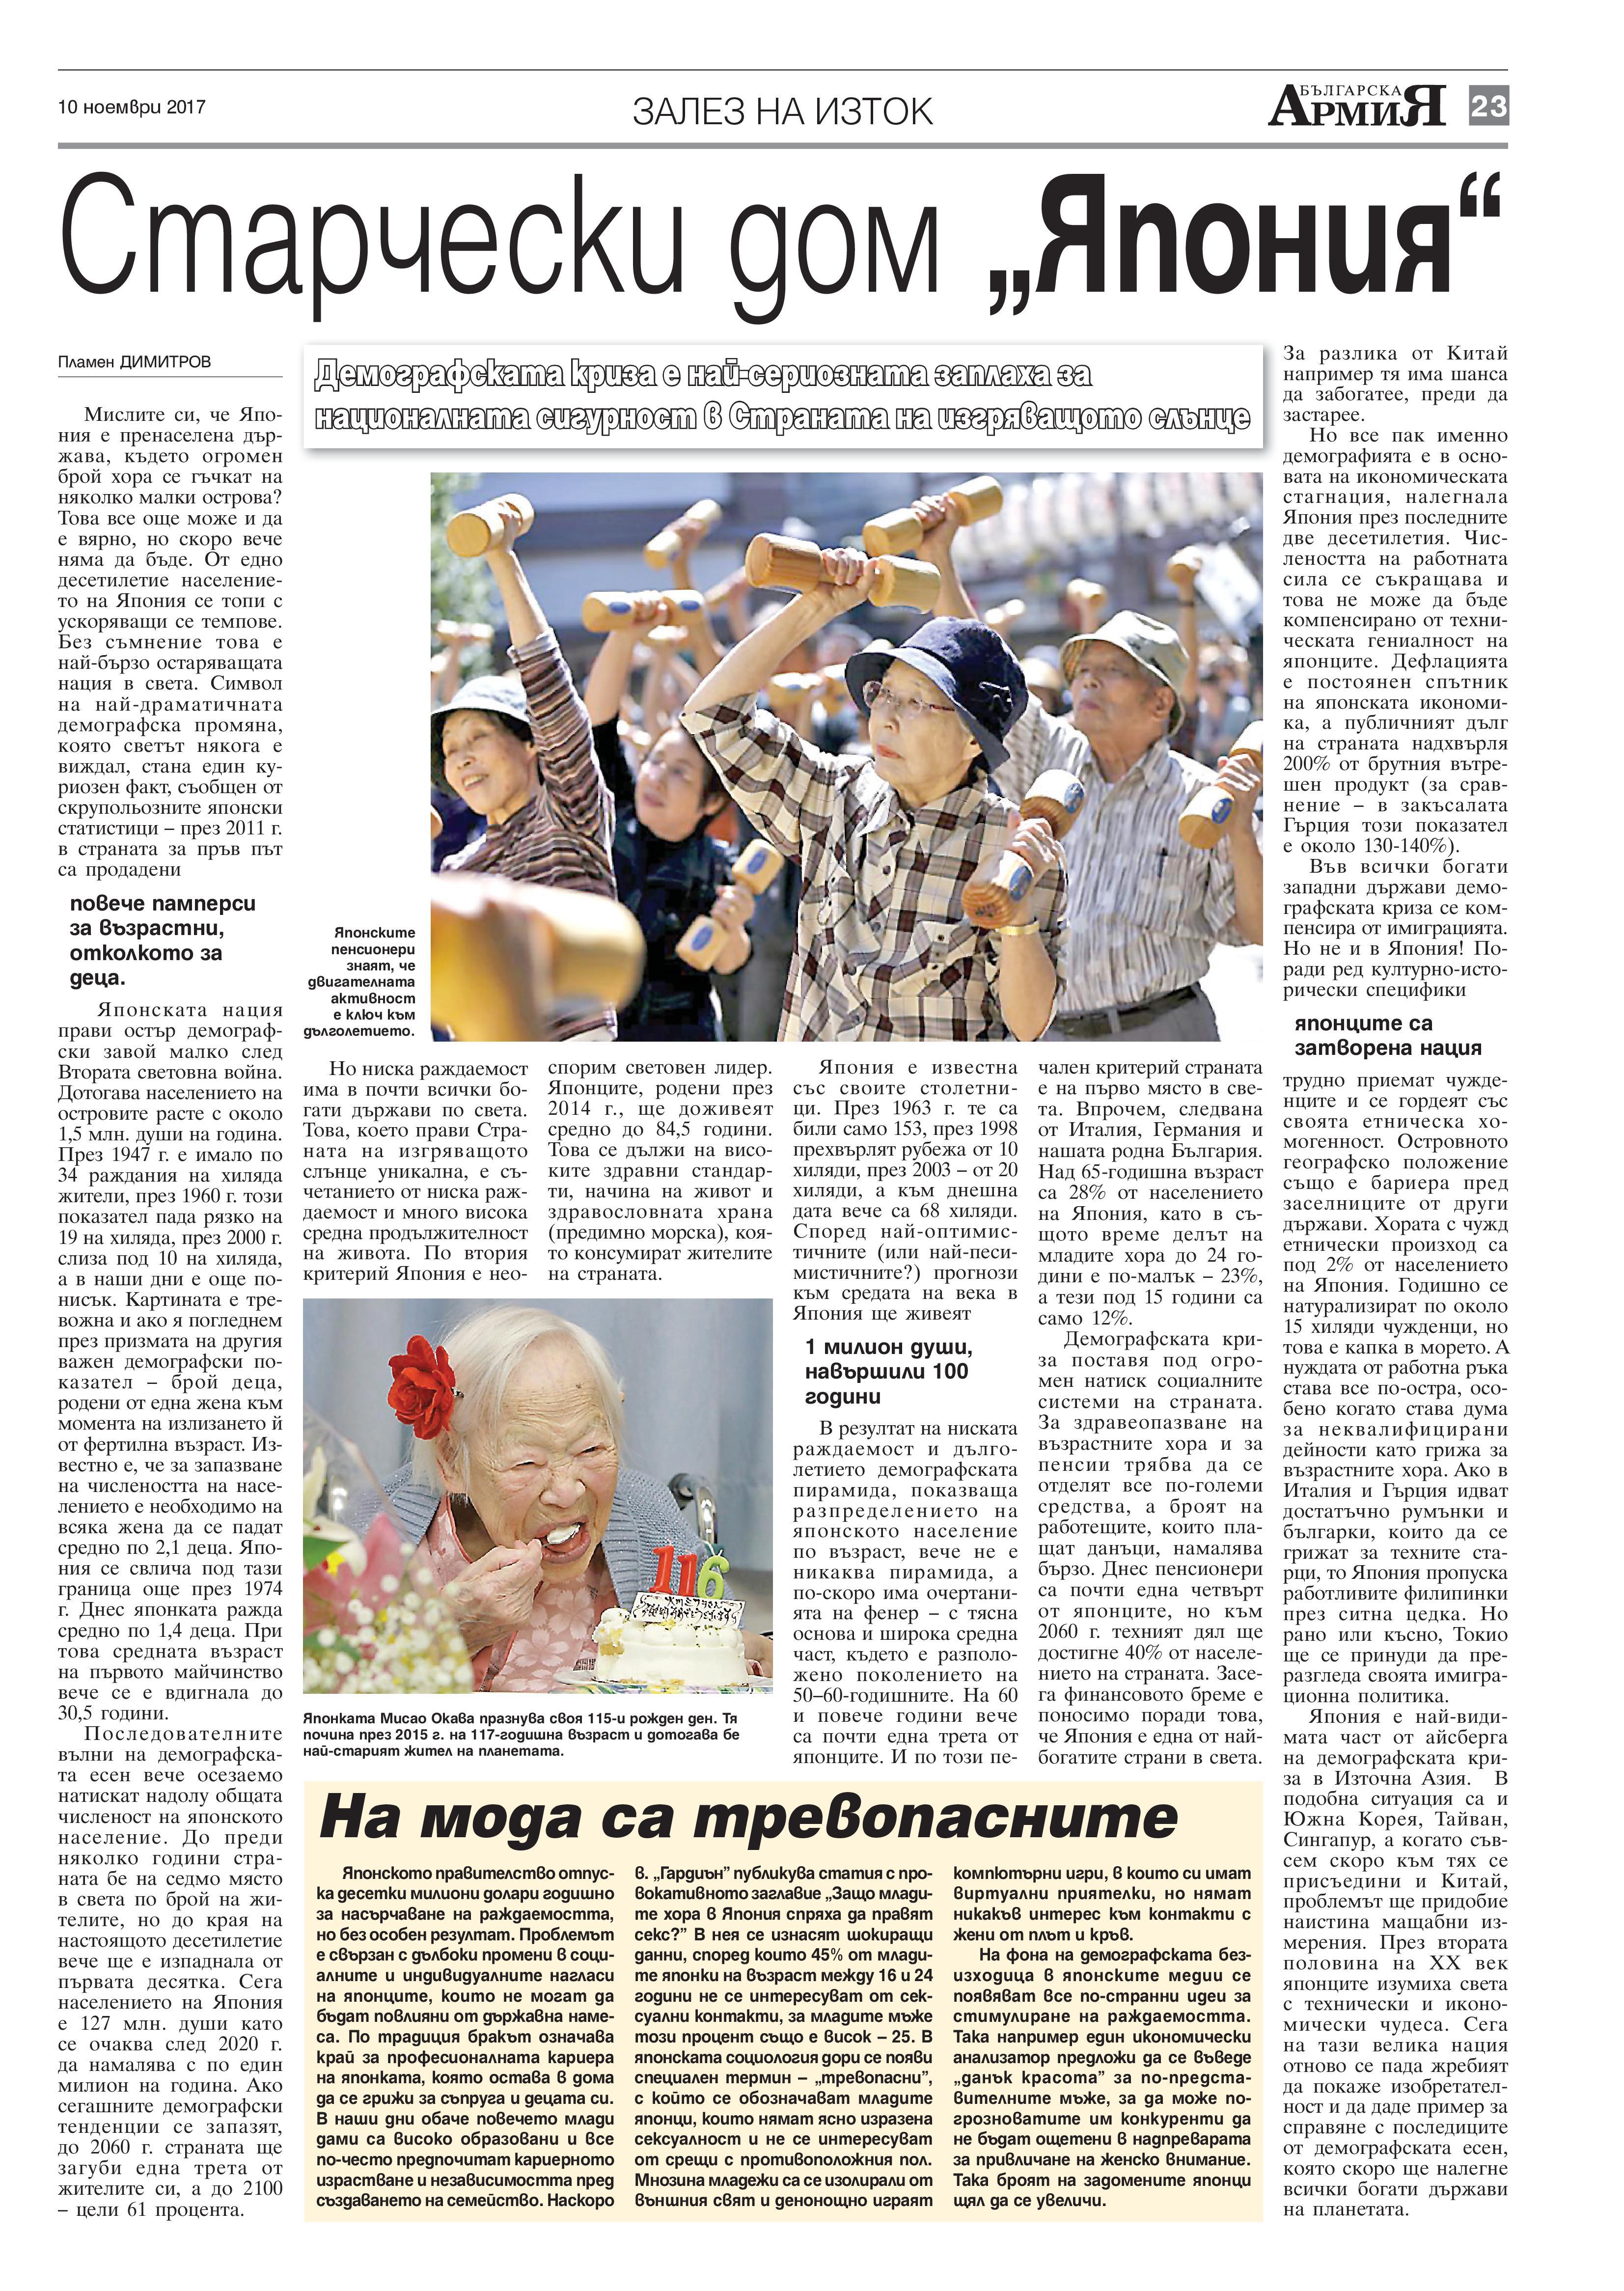 http://armymedia.bg/wp-content/uploads/2015/06/23-11.jpg